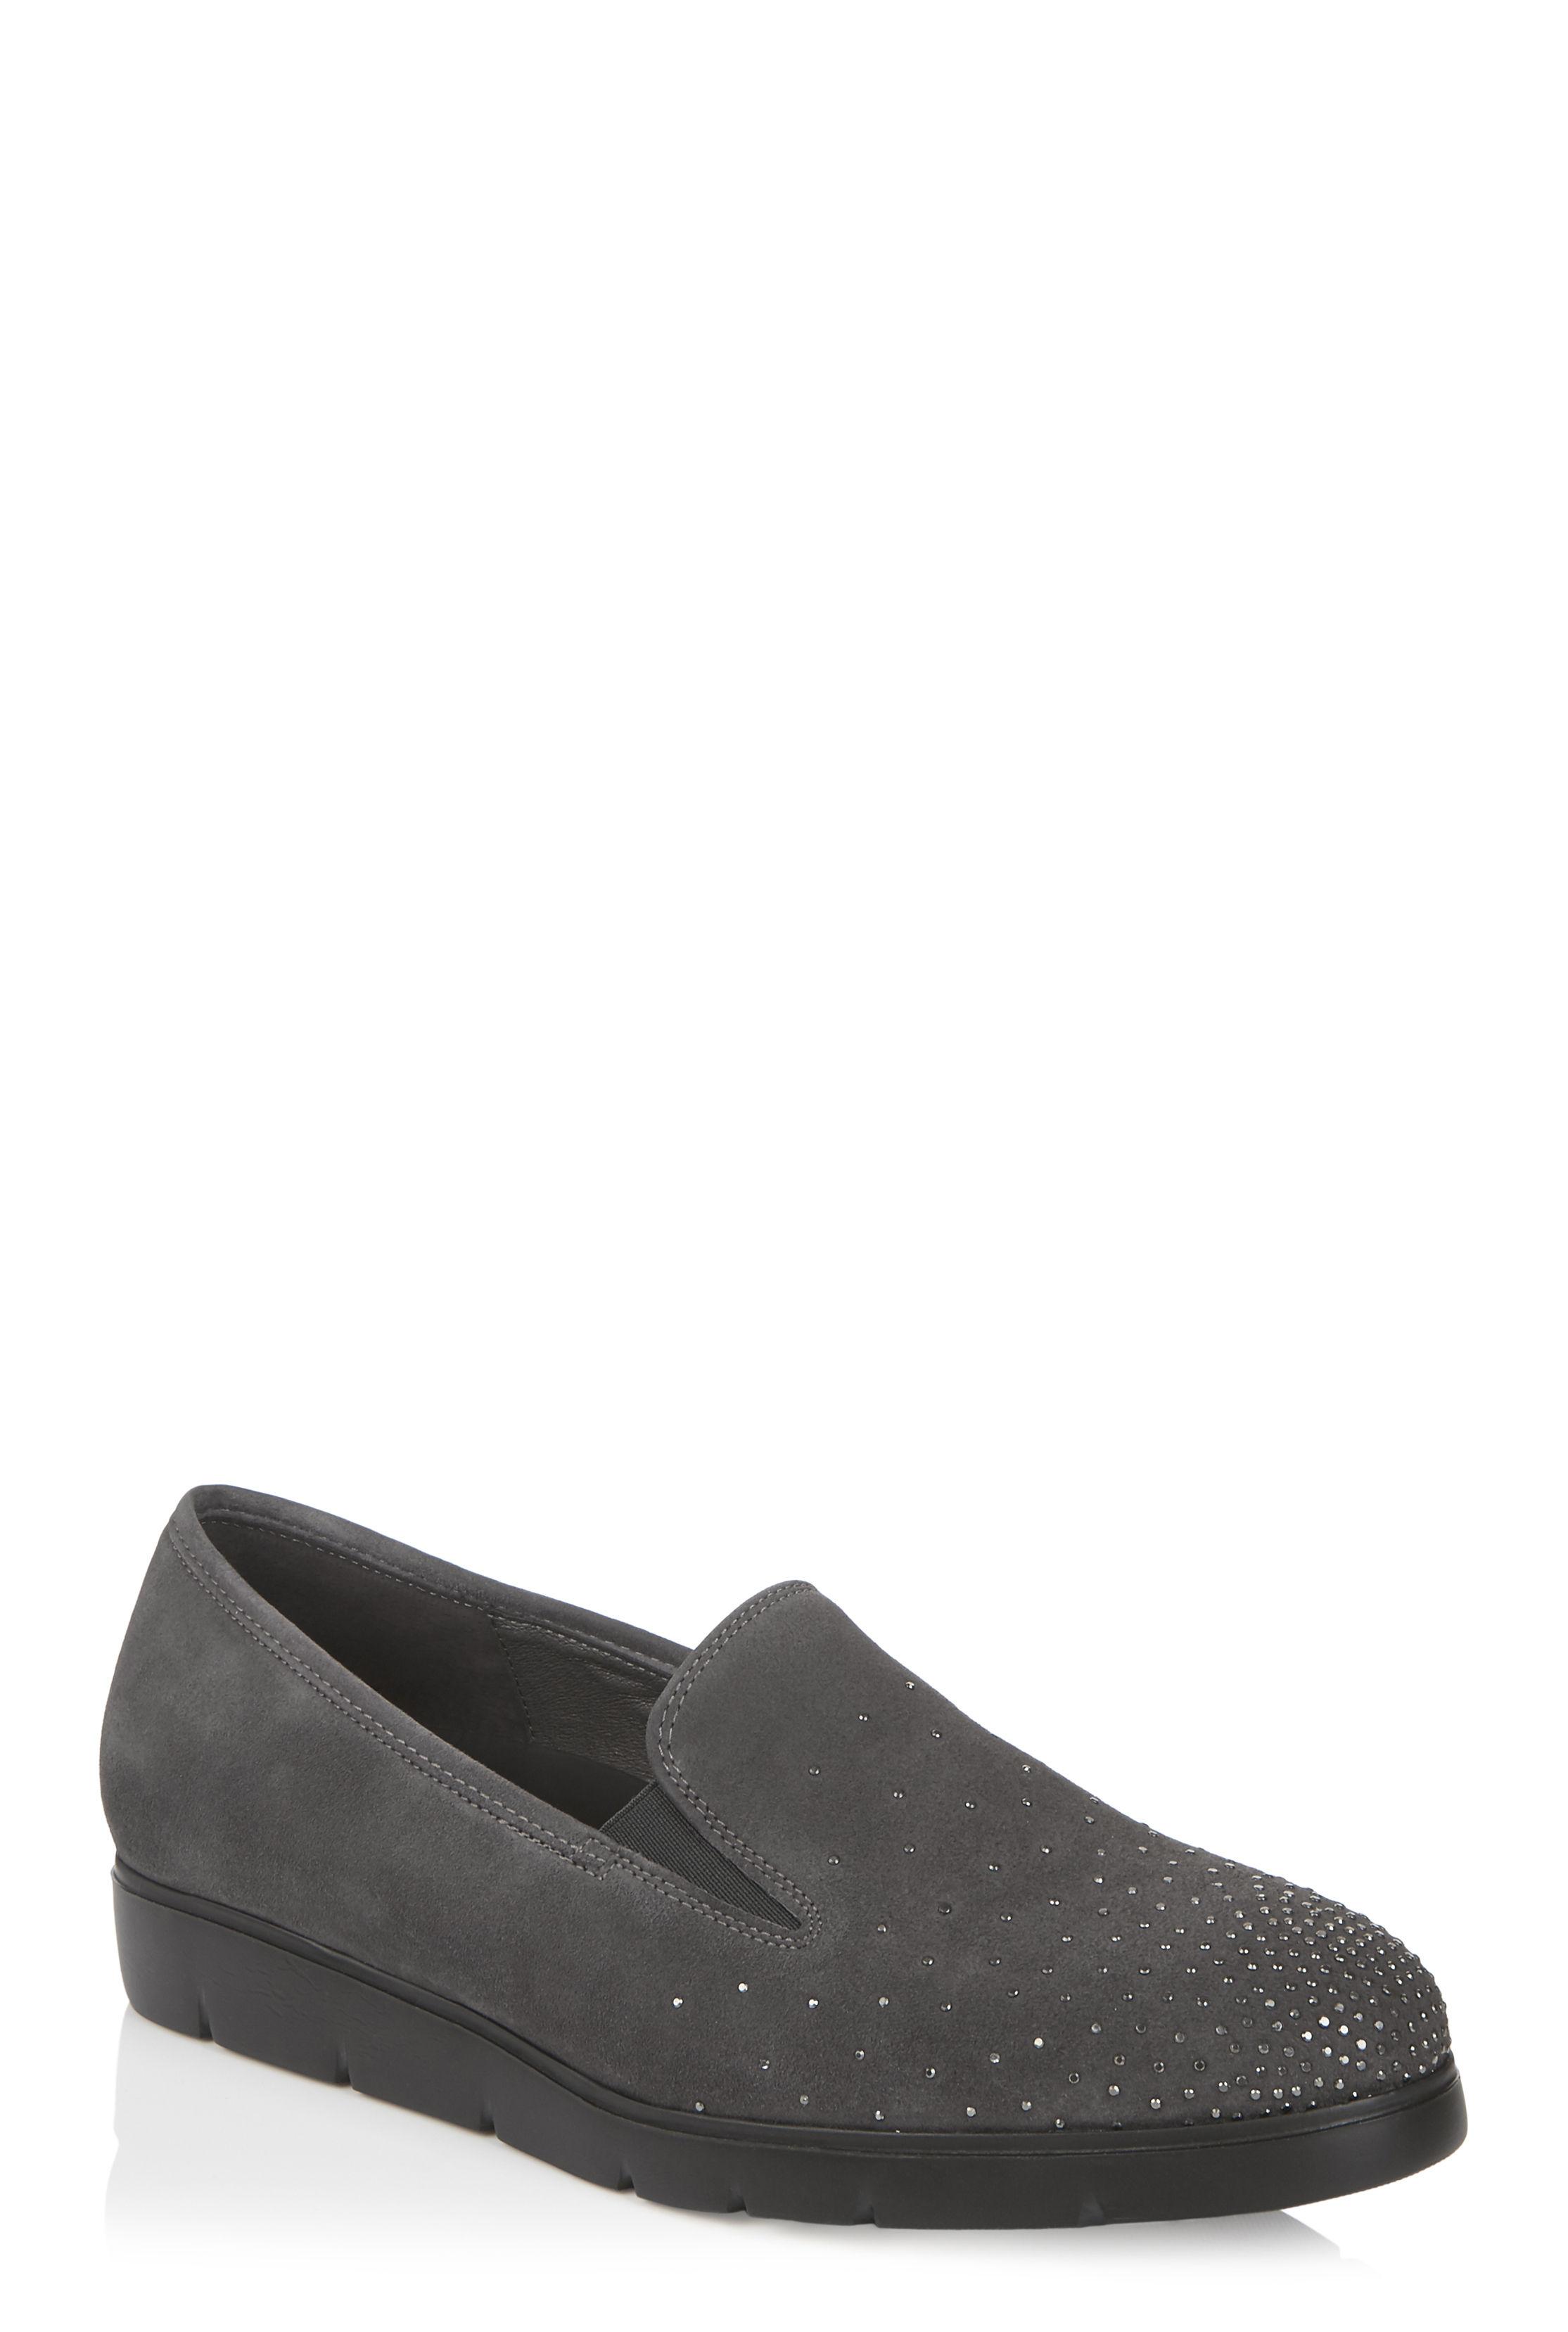 Grey Gabor Studded Angela Flat